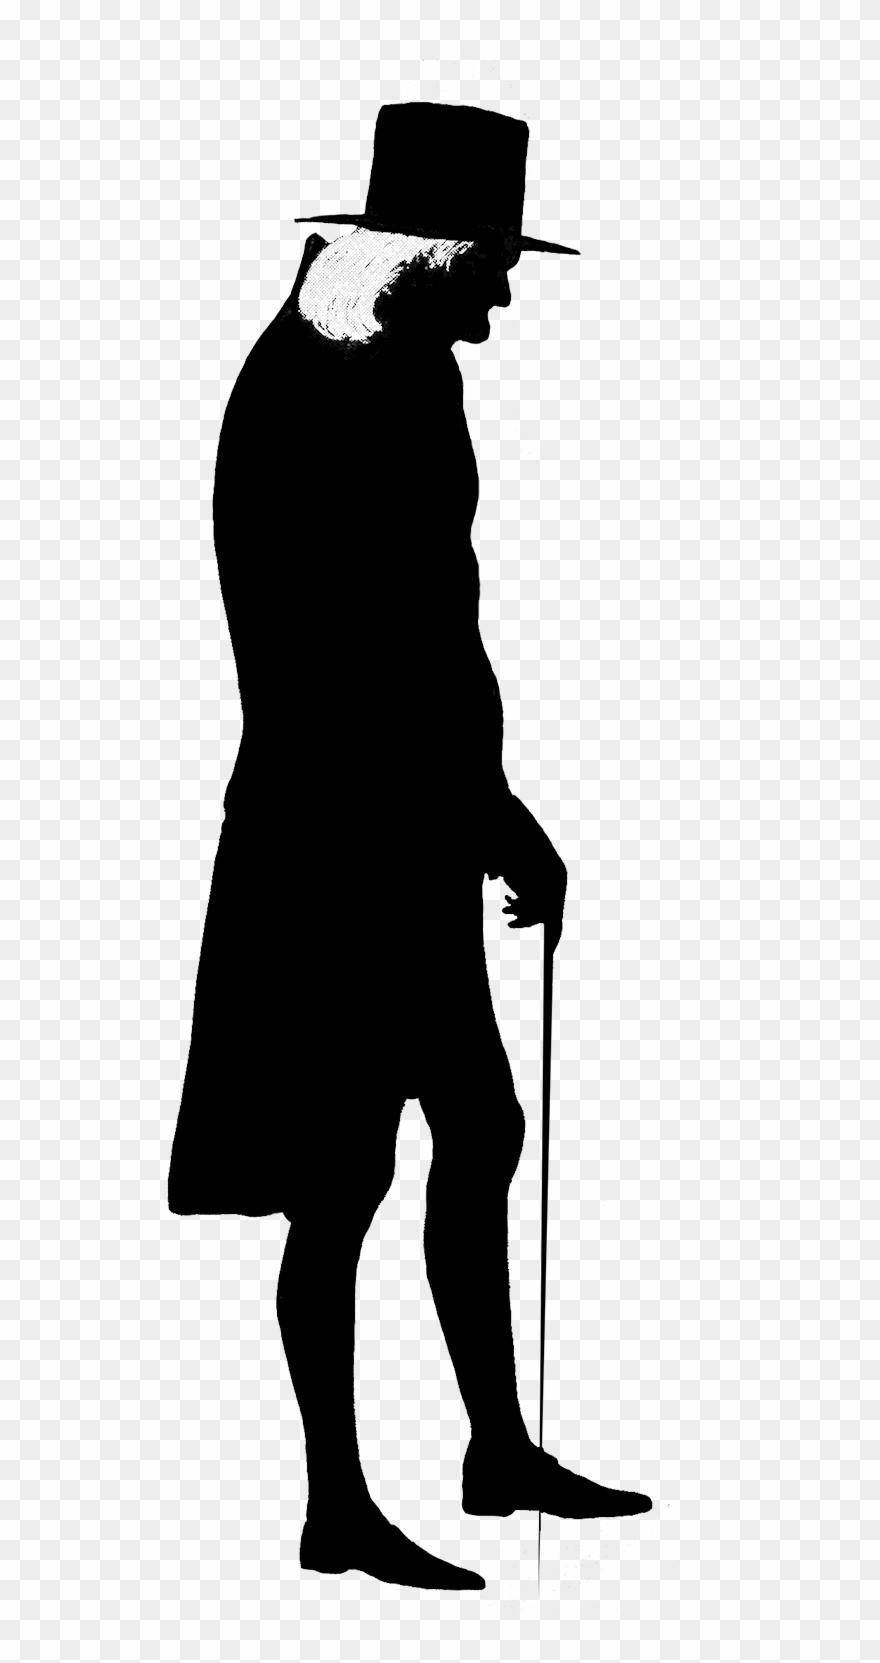 medium resolution of silhouette man old transparent silhouette man clipart